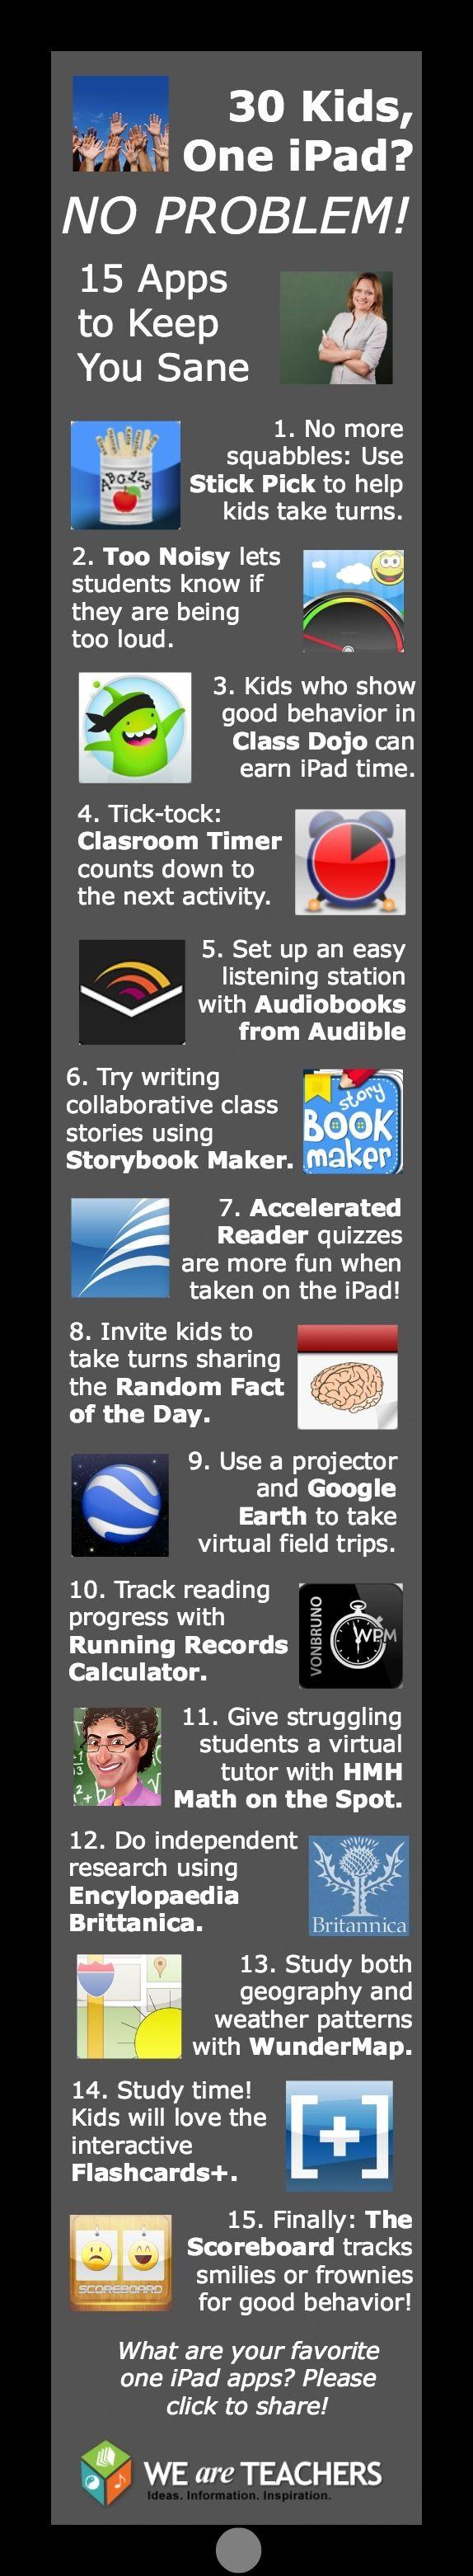 The Teacher's Guide To The One iPad Classroom - Edudemic